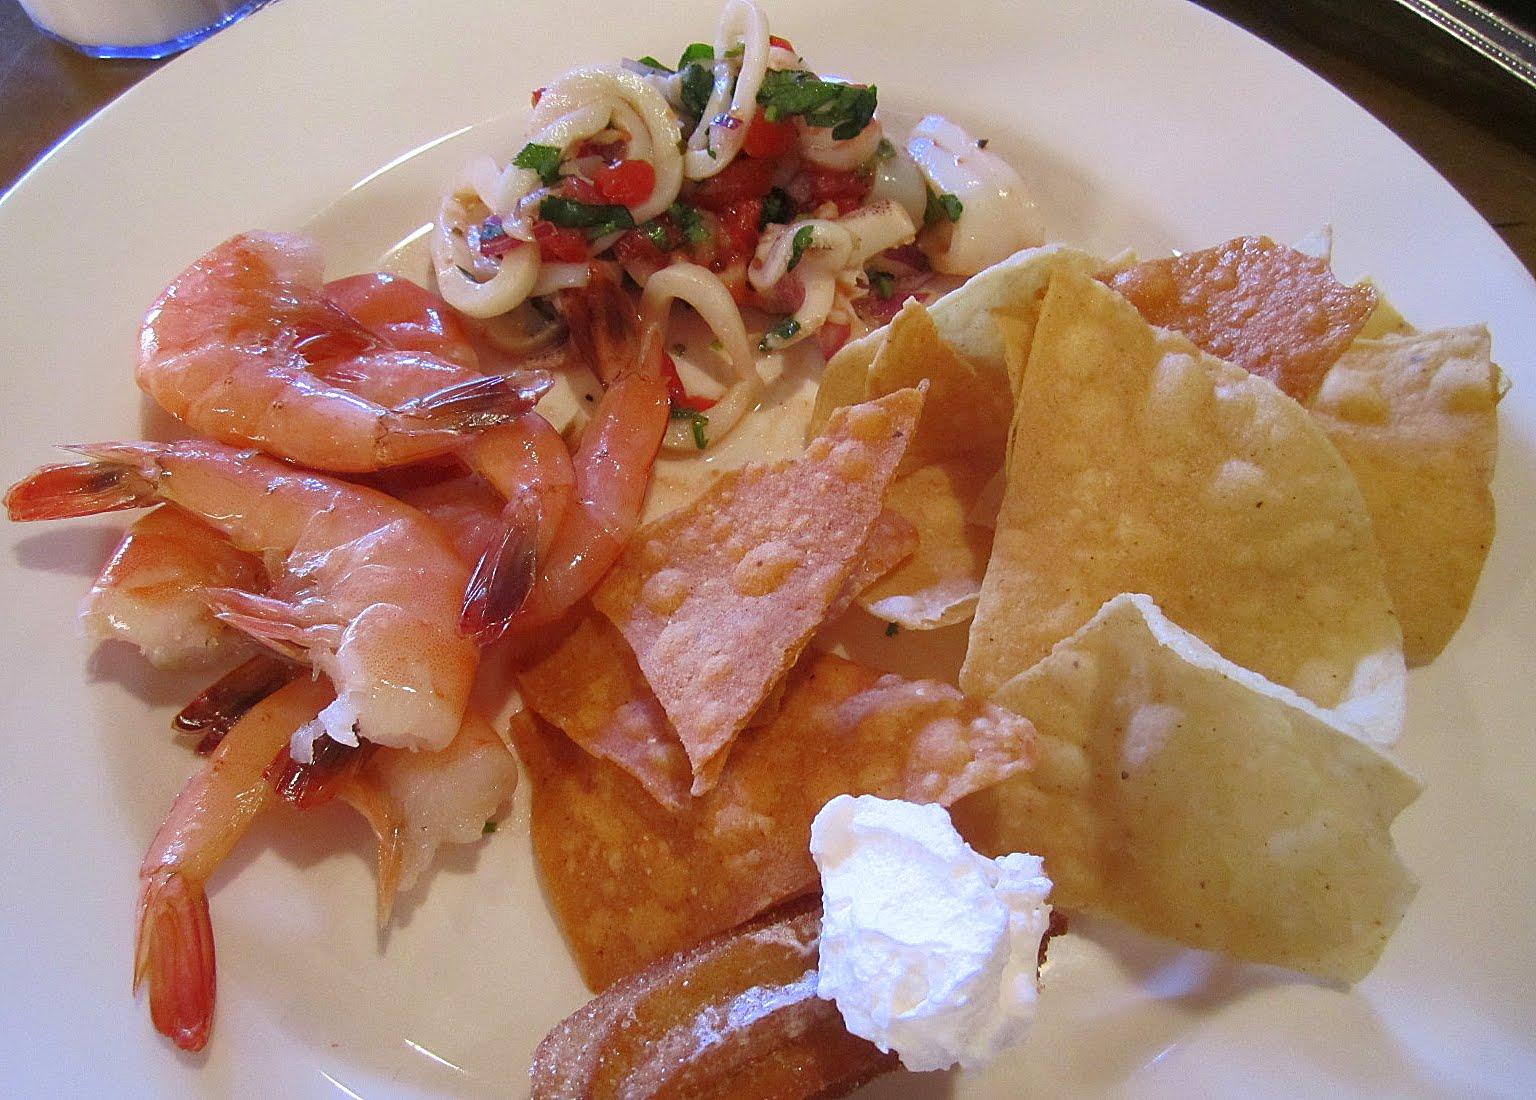 Christmas day buffet - Review of El Torito Grill, Irvine, CA - TripAdvisor El torito fashion island brunch